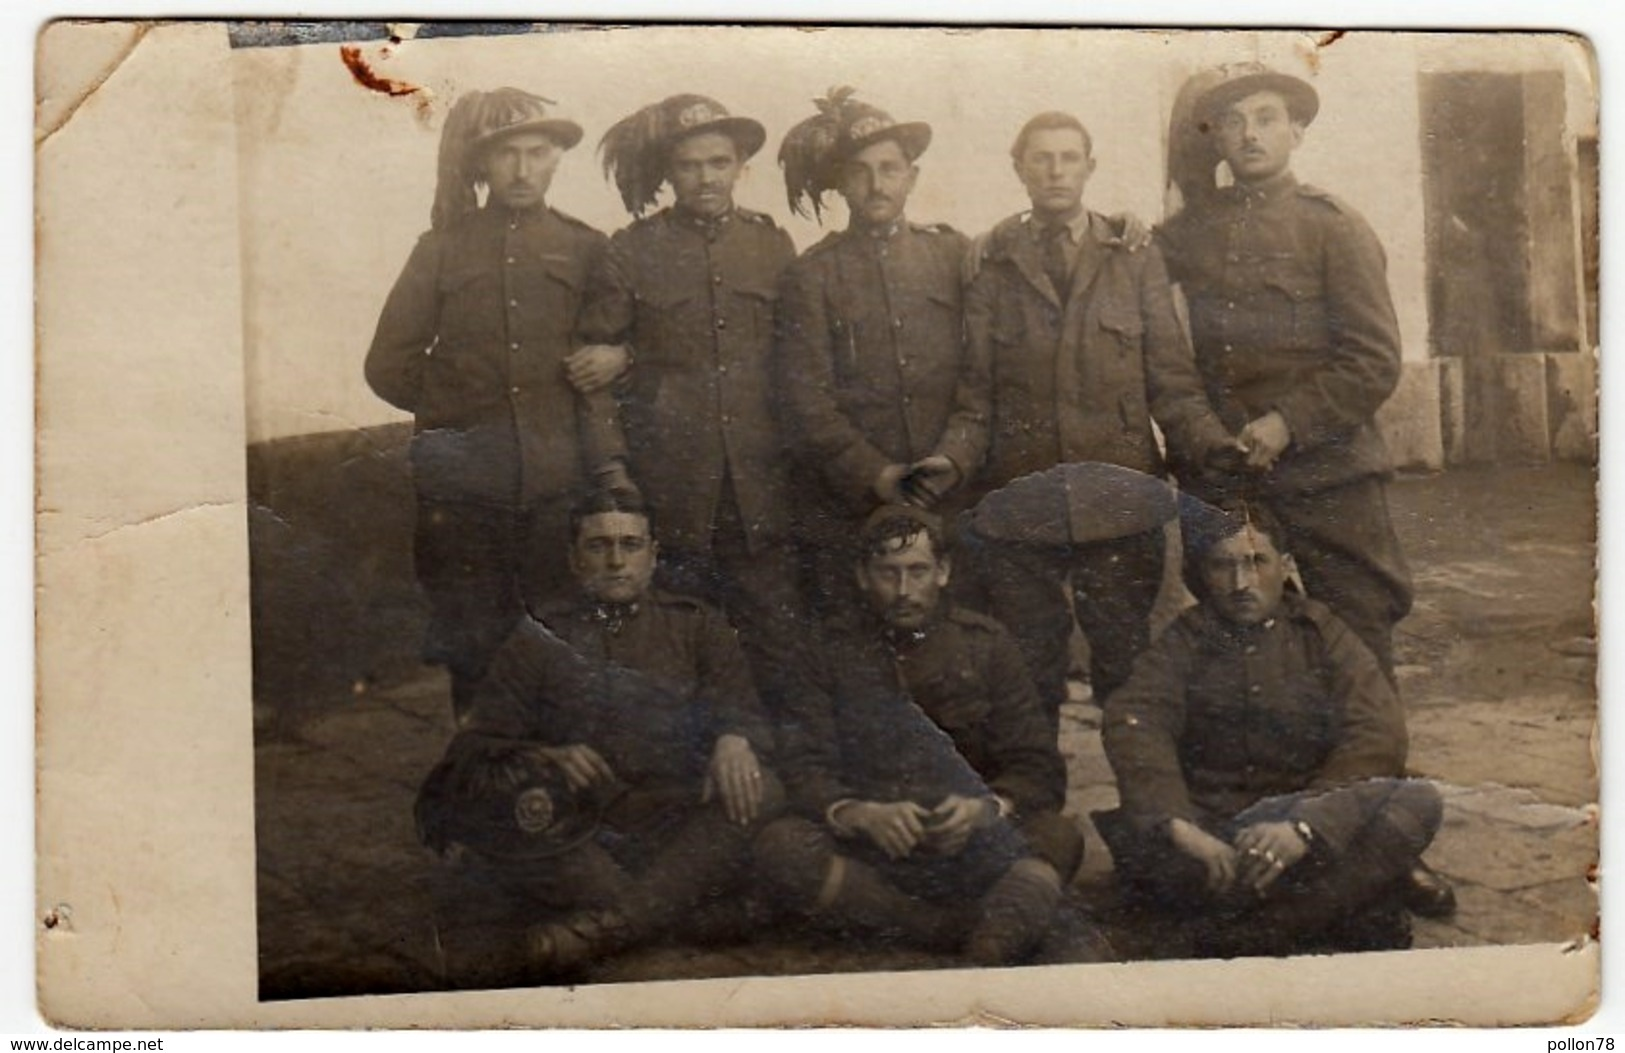 VECCHIA FOTOGRAFIA - OLD PHOTO - MILITARI - BERSAGLIERI - 1919 - Vedi Retro - Guerra, Militares